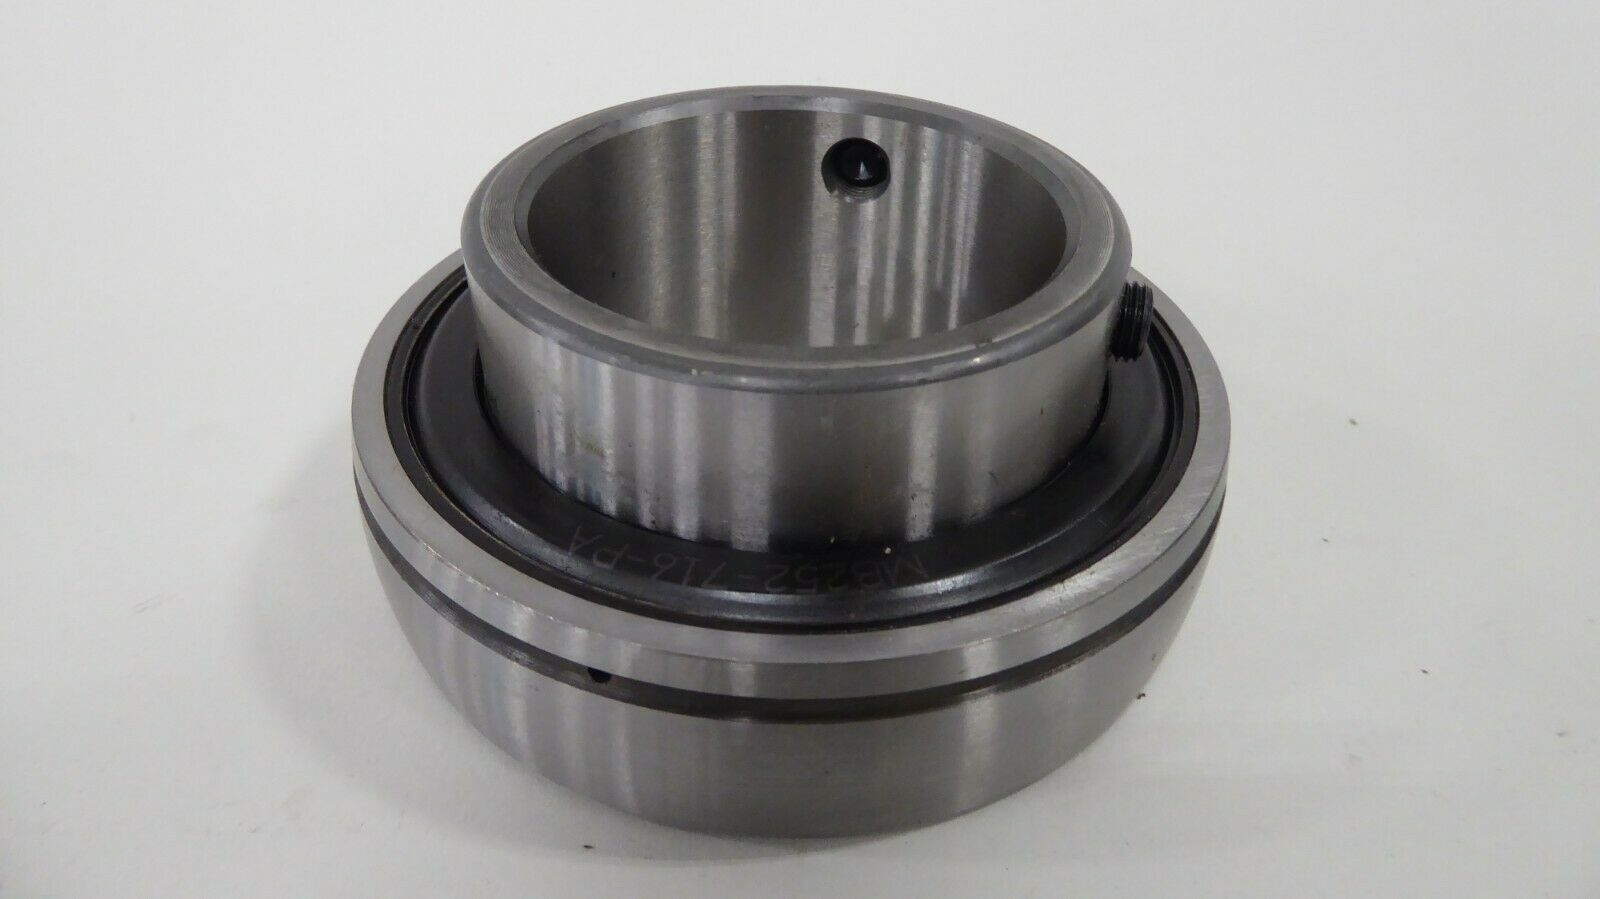 MB Manufacturing MB252-716-PA Ball Bearing Insert 2-7 16  Bore Nyla-K